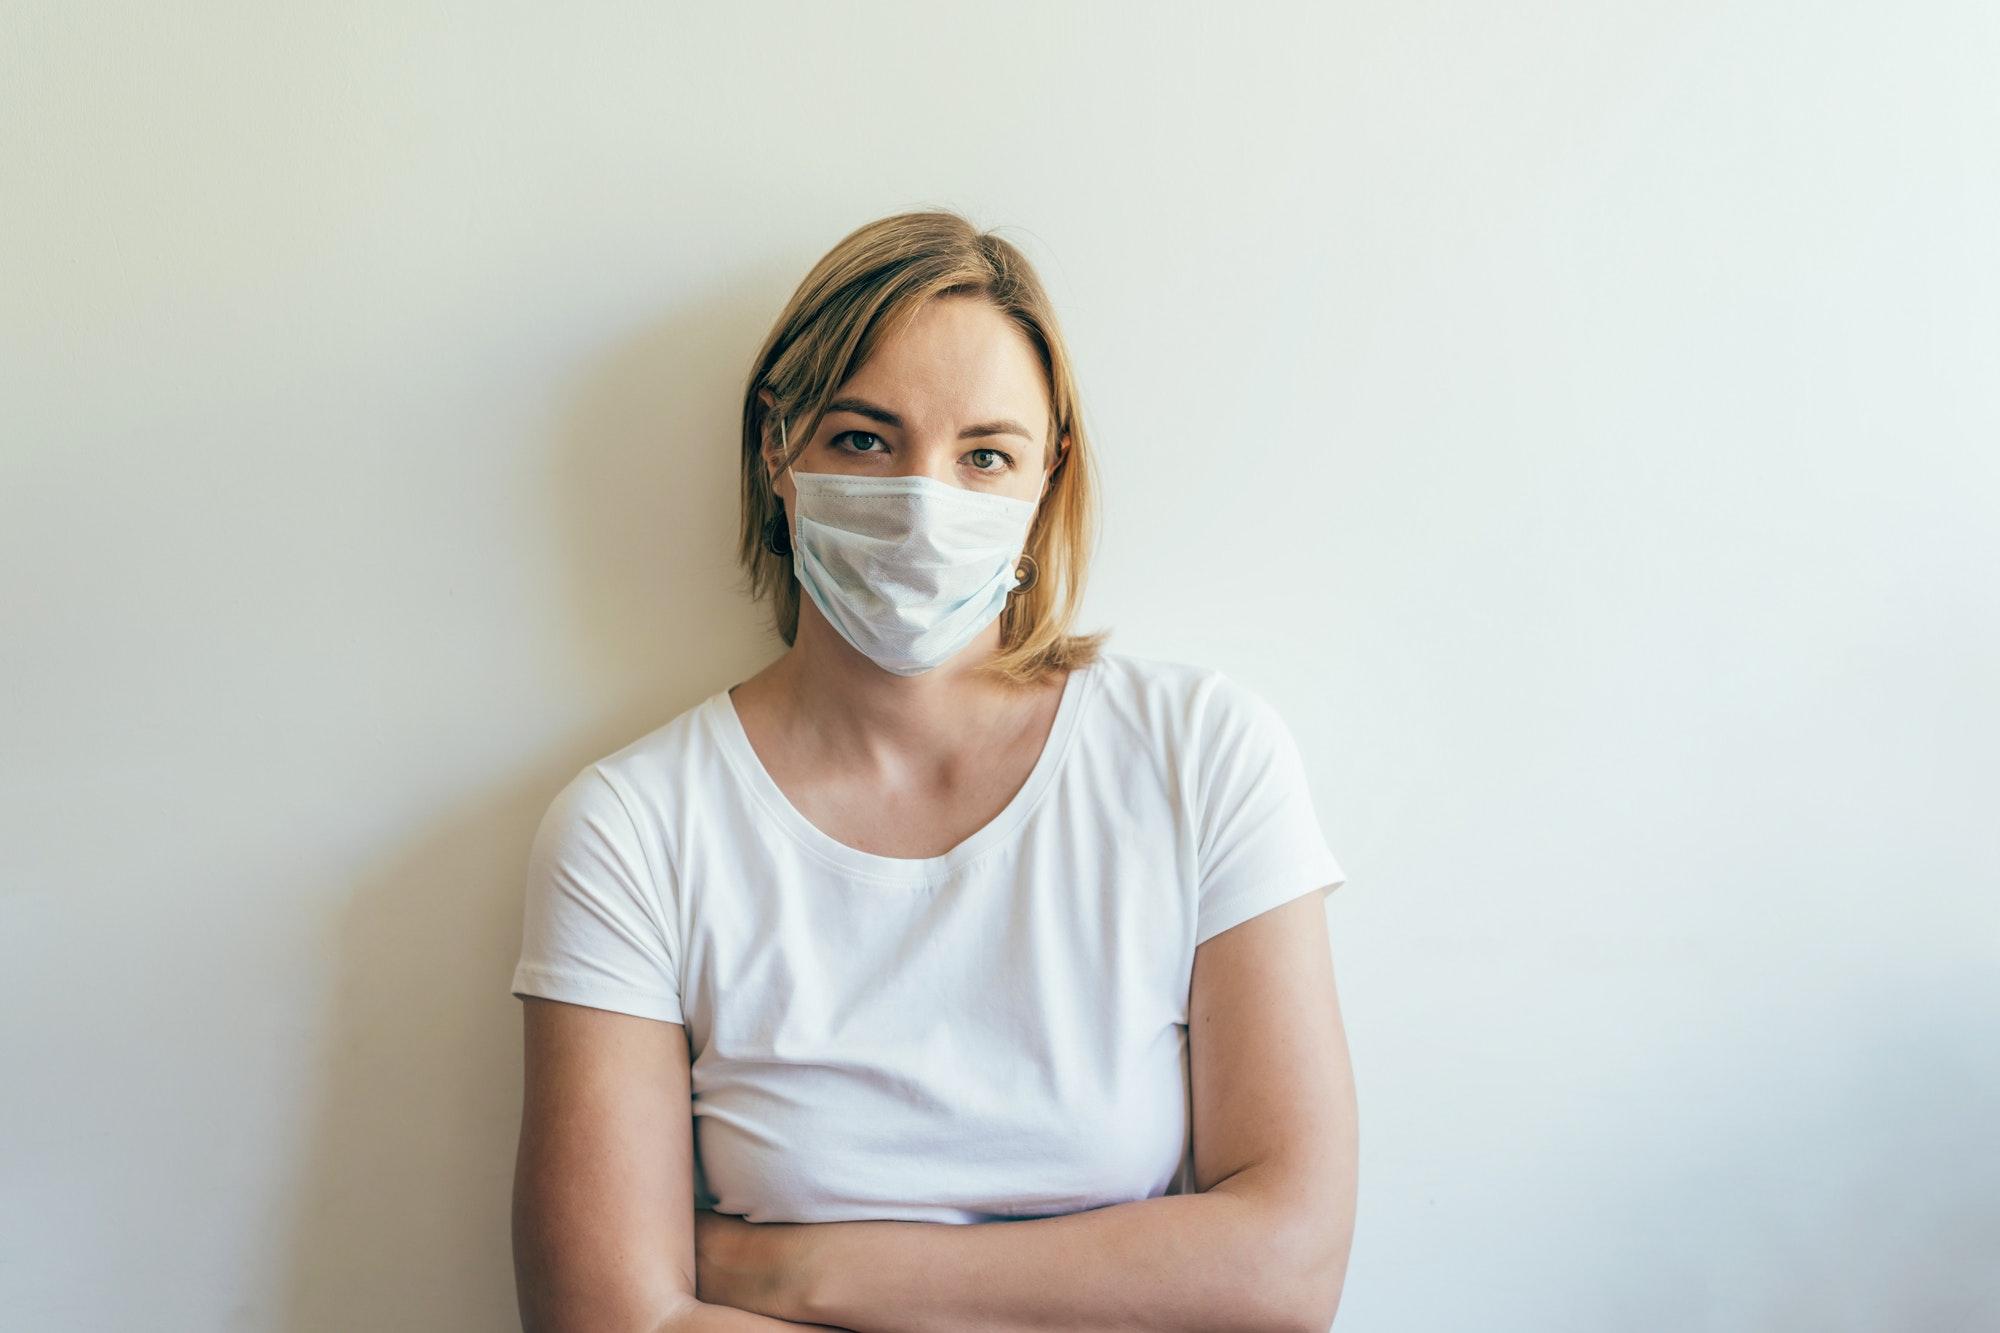 person; woman; virus; epidemic; medical; disease; flu; illness; mask; protection; sick; female;